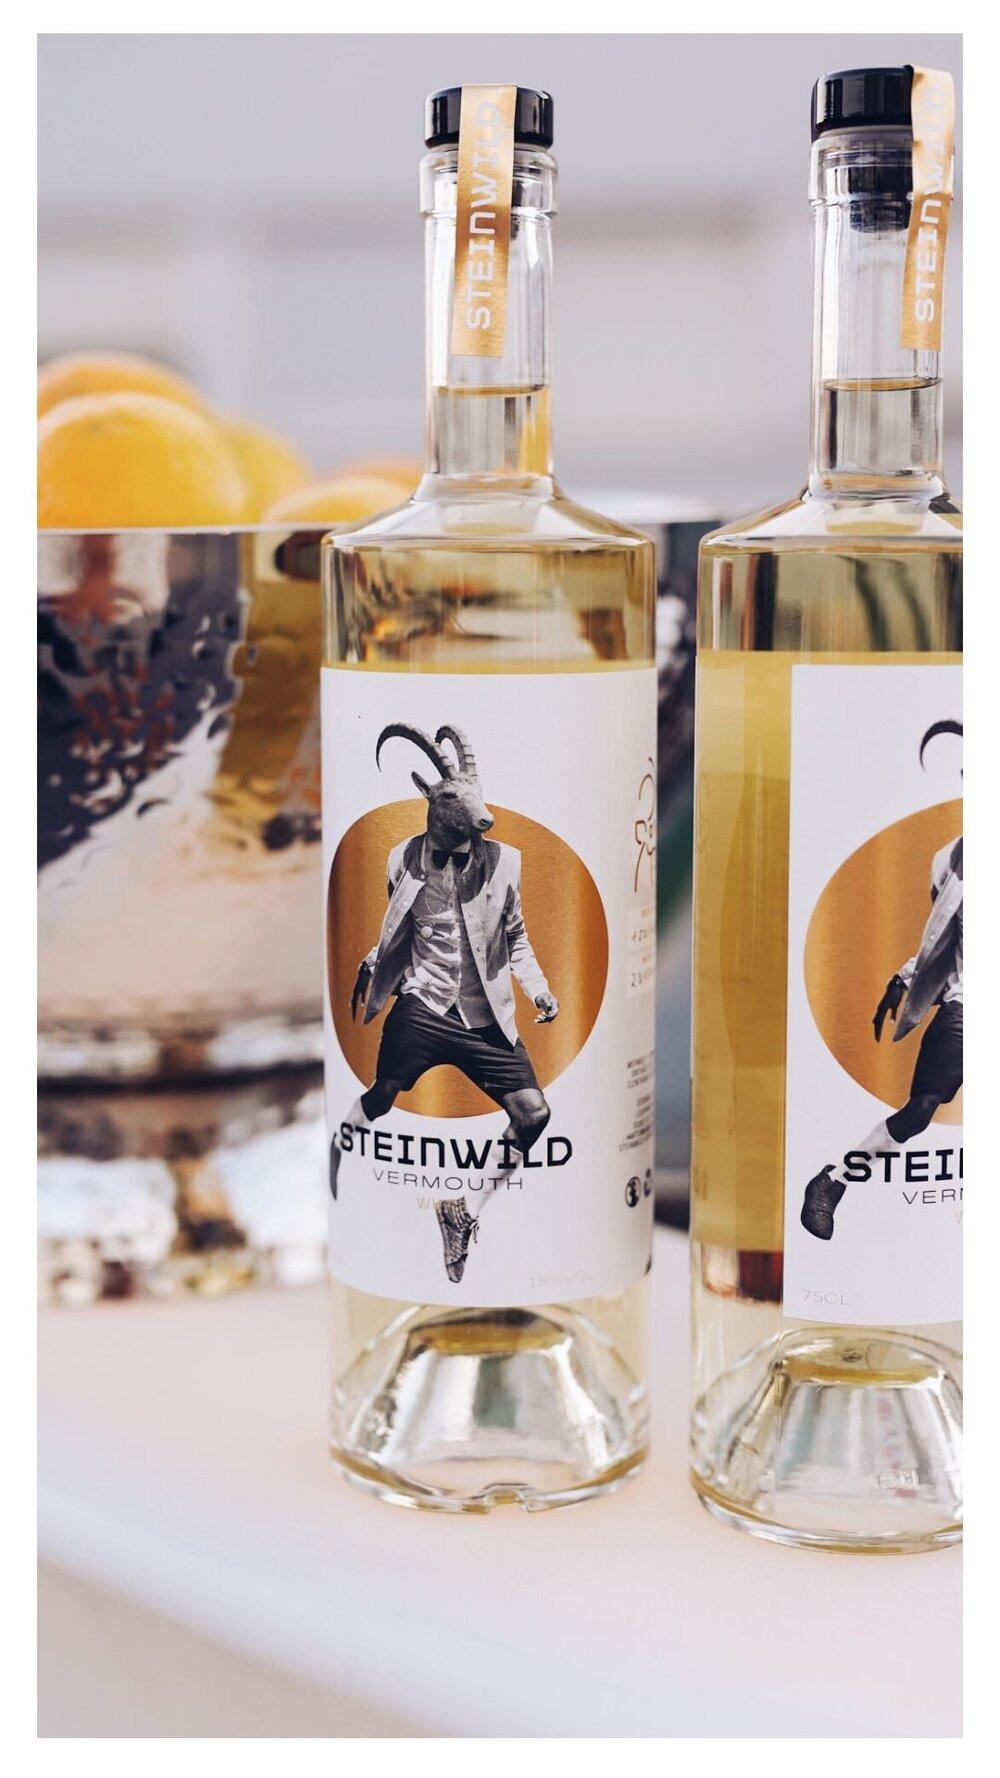 Stinwild Vermouth - Tasting - Urban Spaces_320.JPG